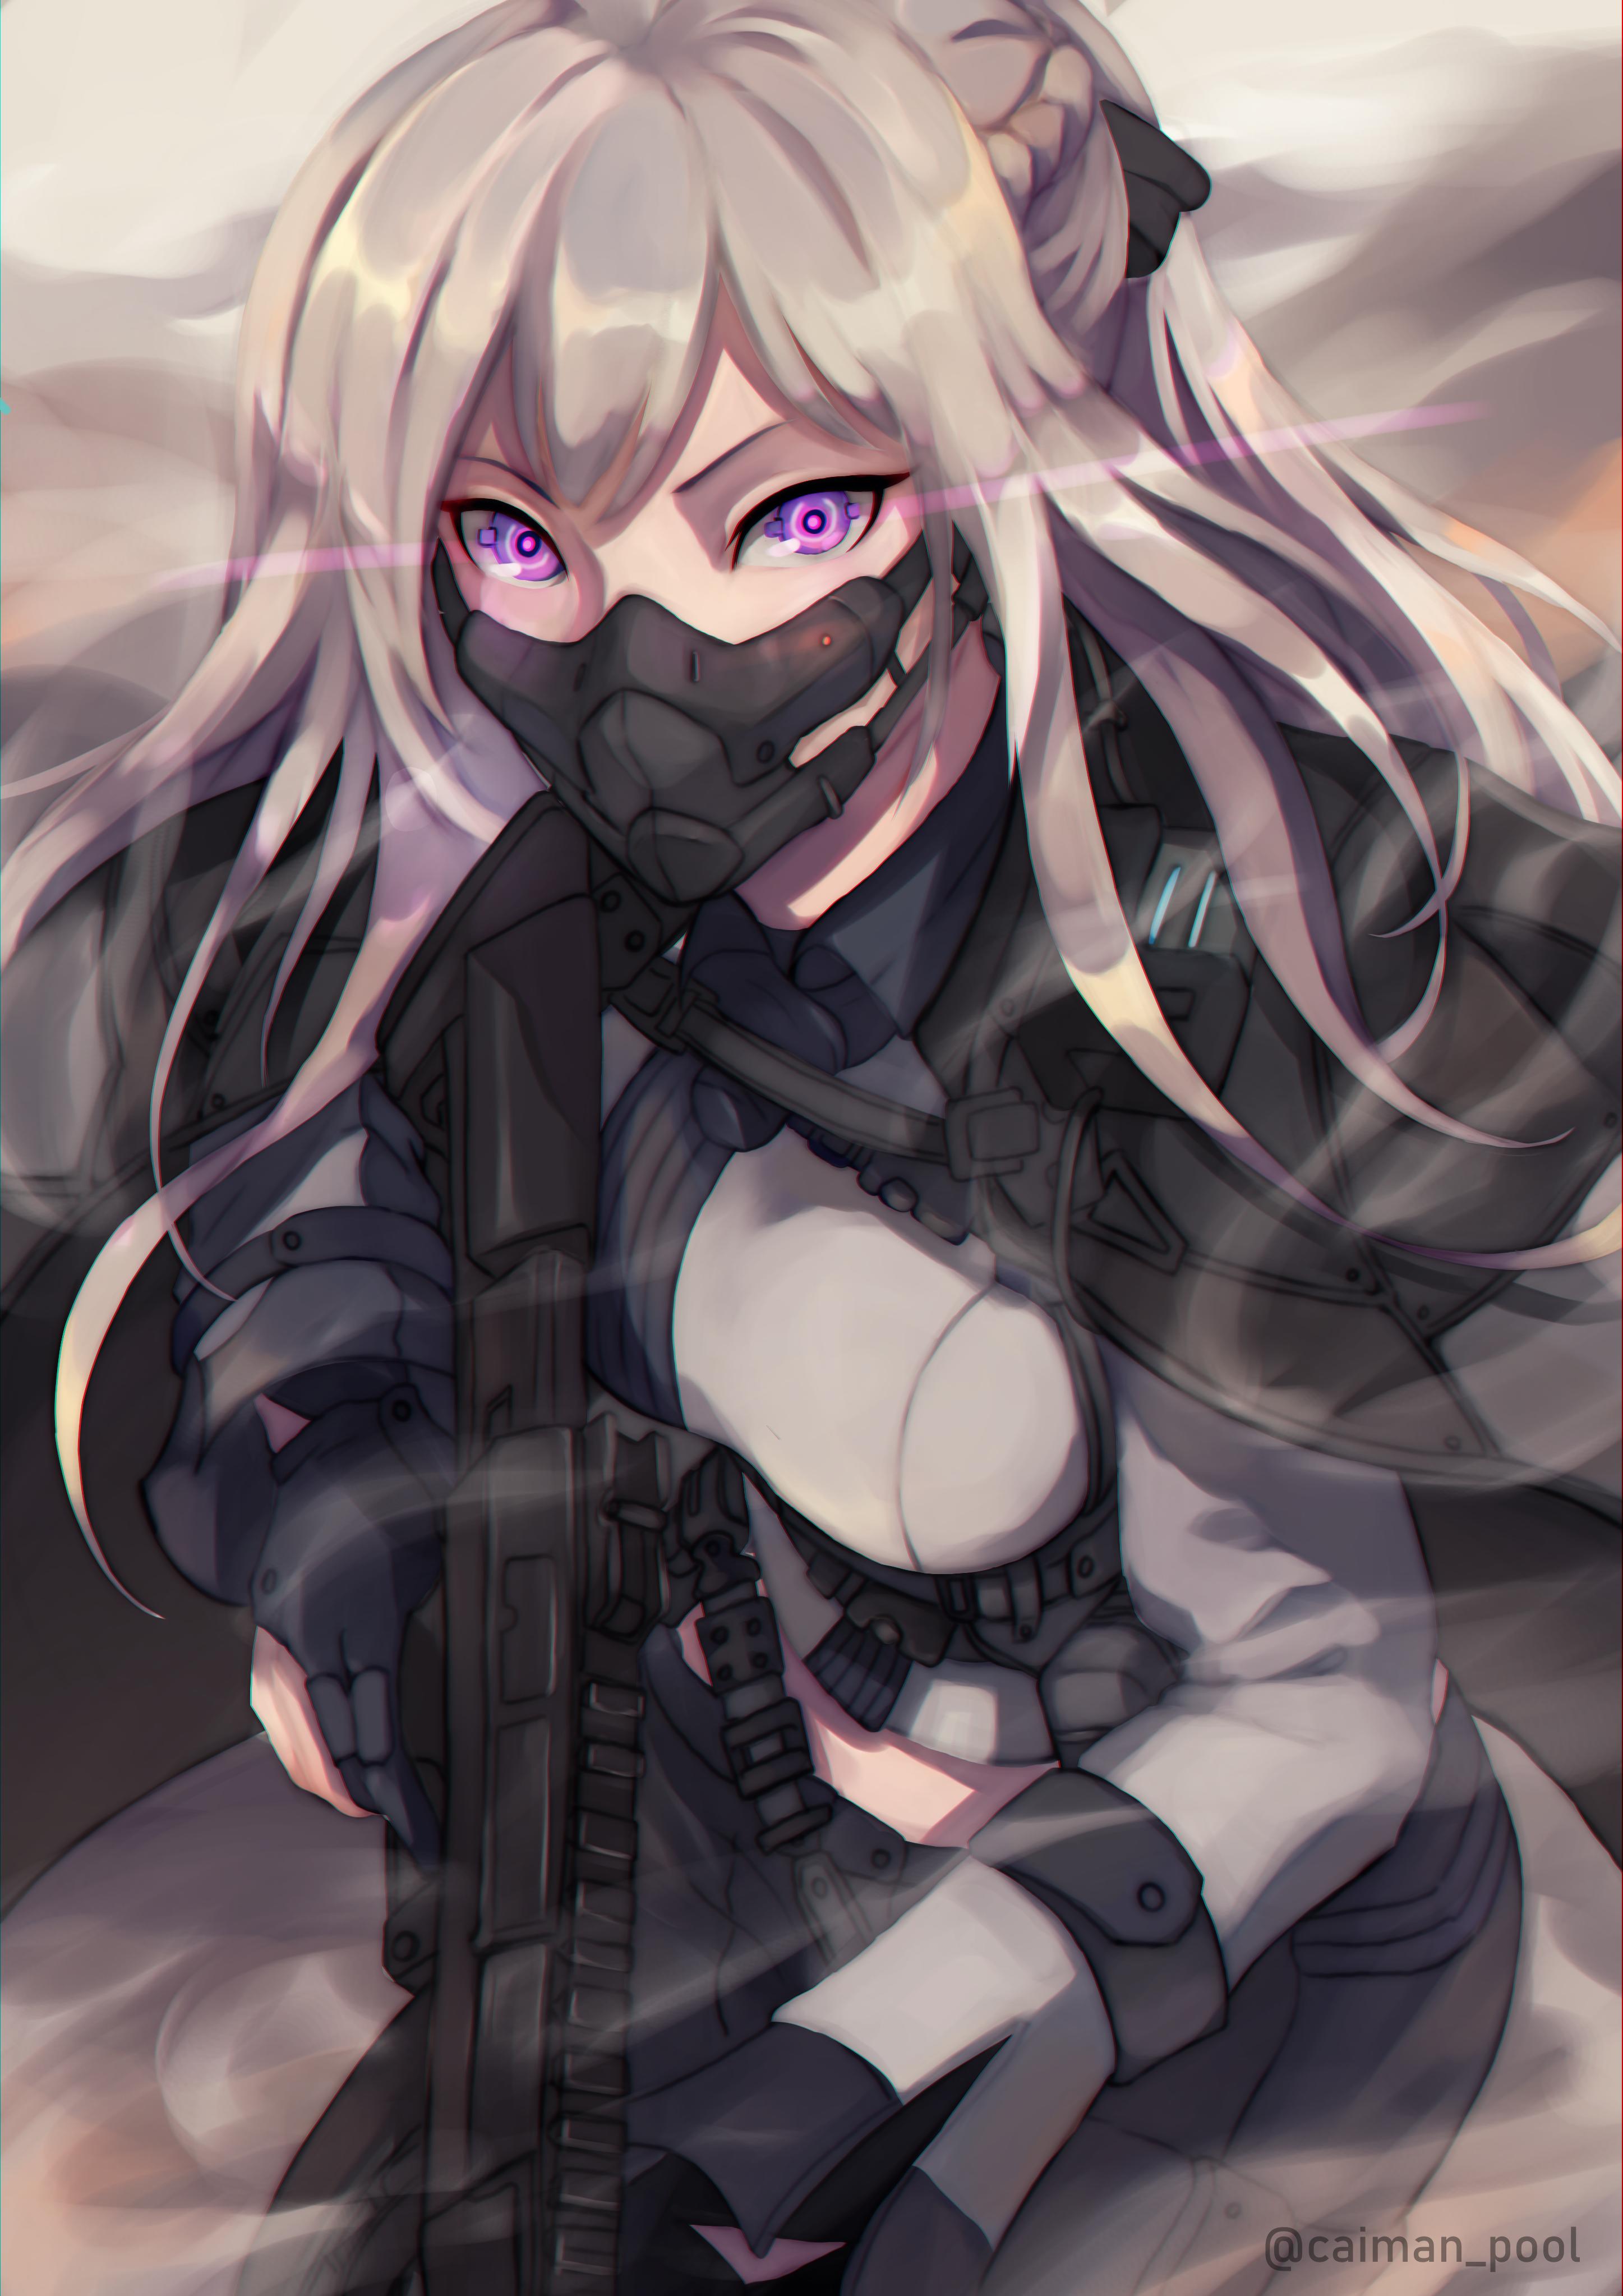 AK-12 from Girls Frontline